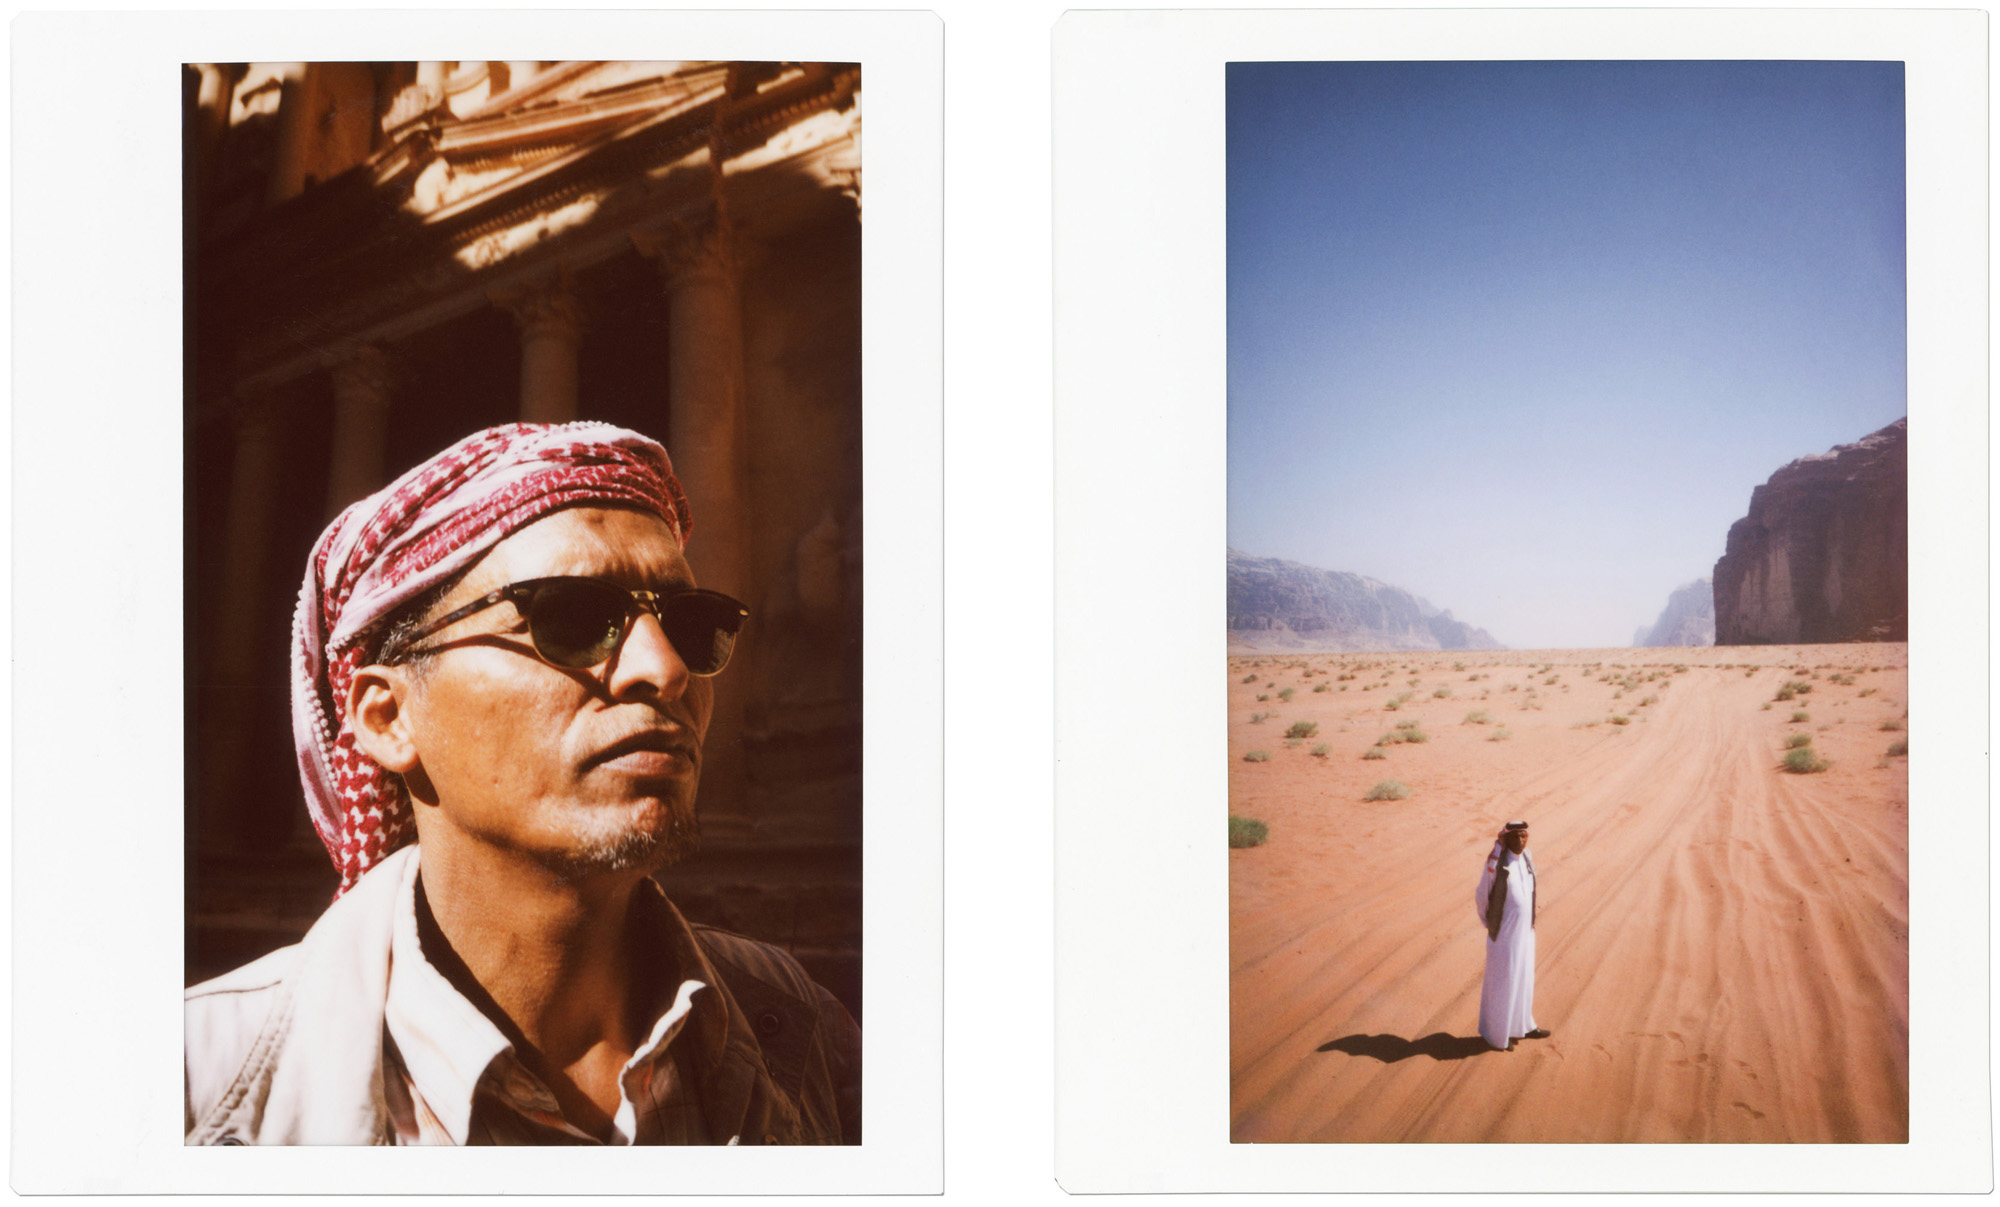 Bedouin, Juomaa Koupilan // Jordan